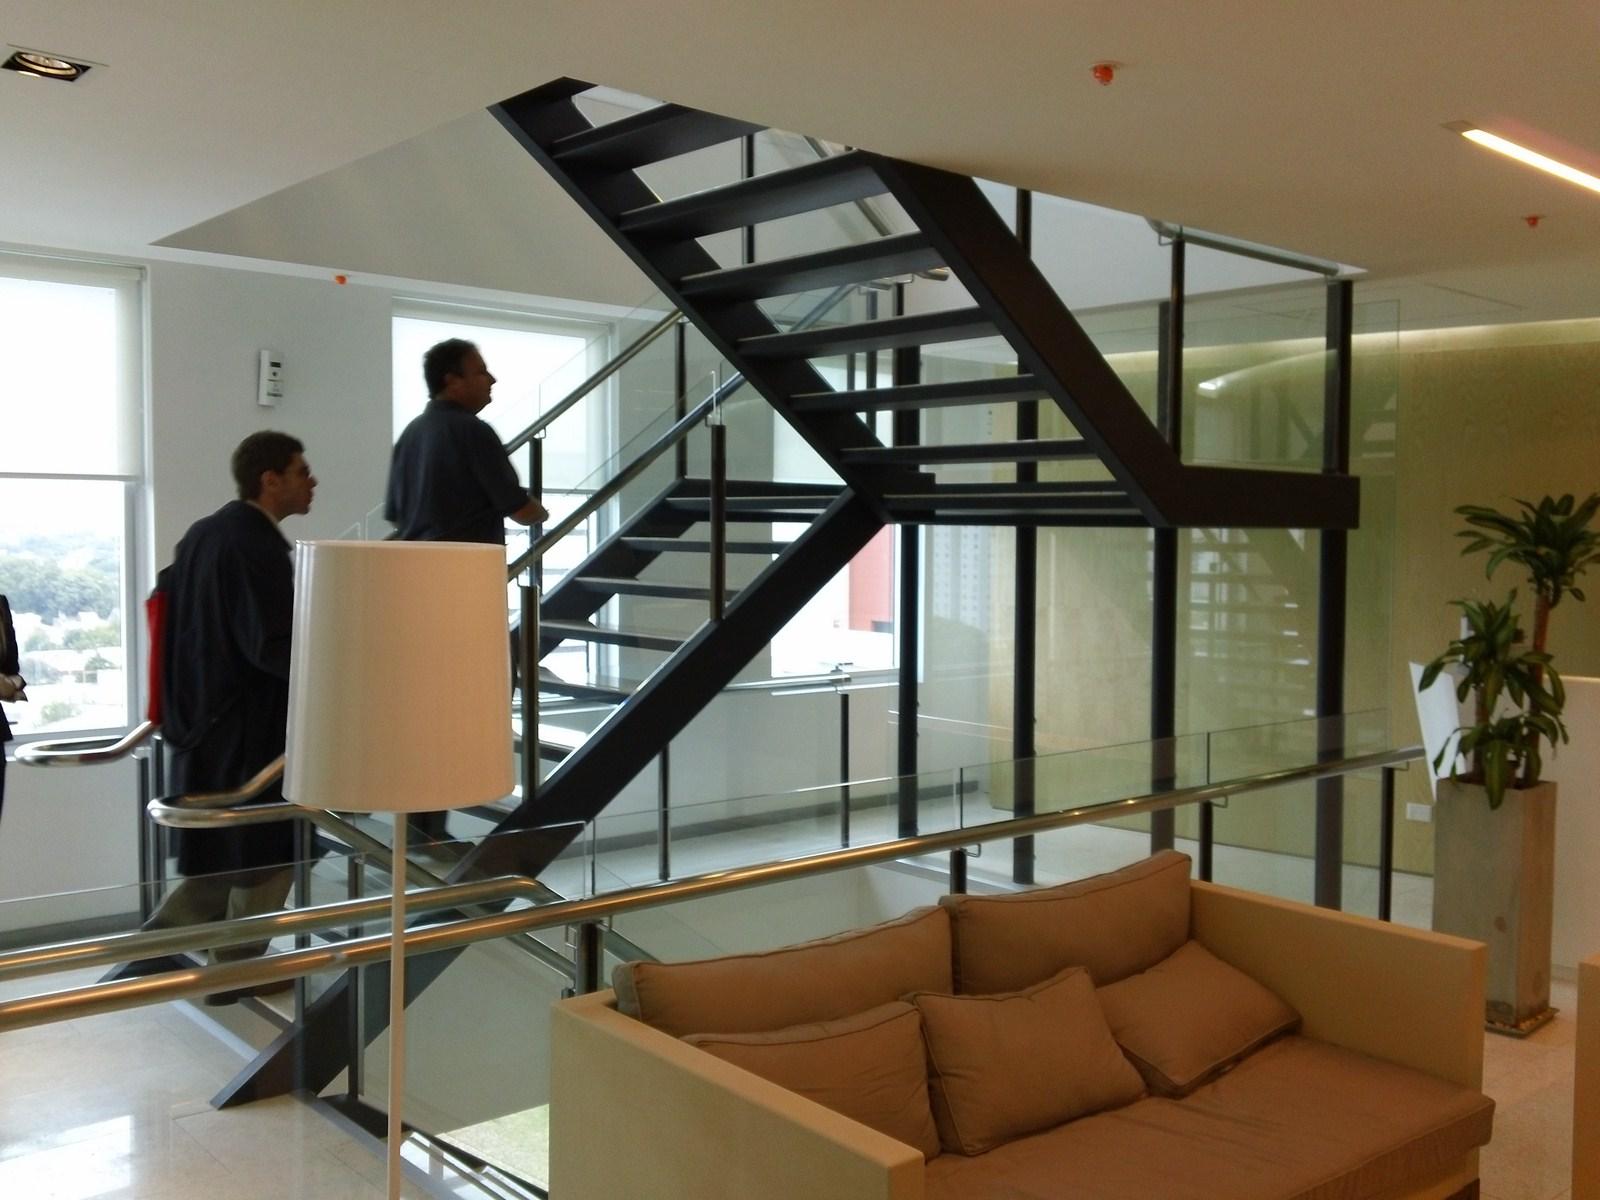 Visita fotogr fica al coraz n de redusers for Escaleras para tres pisos